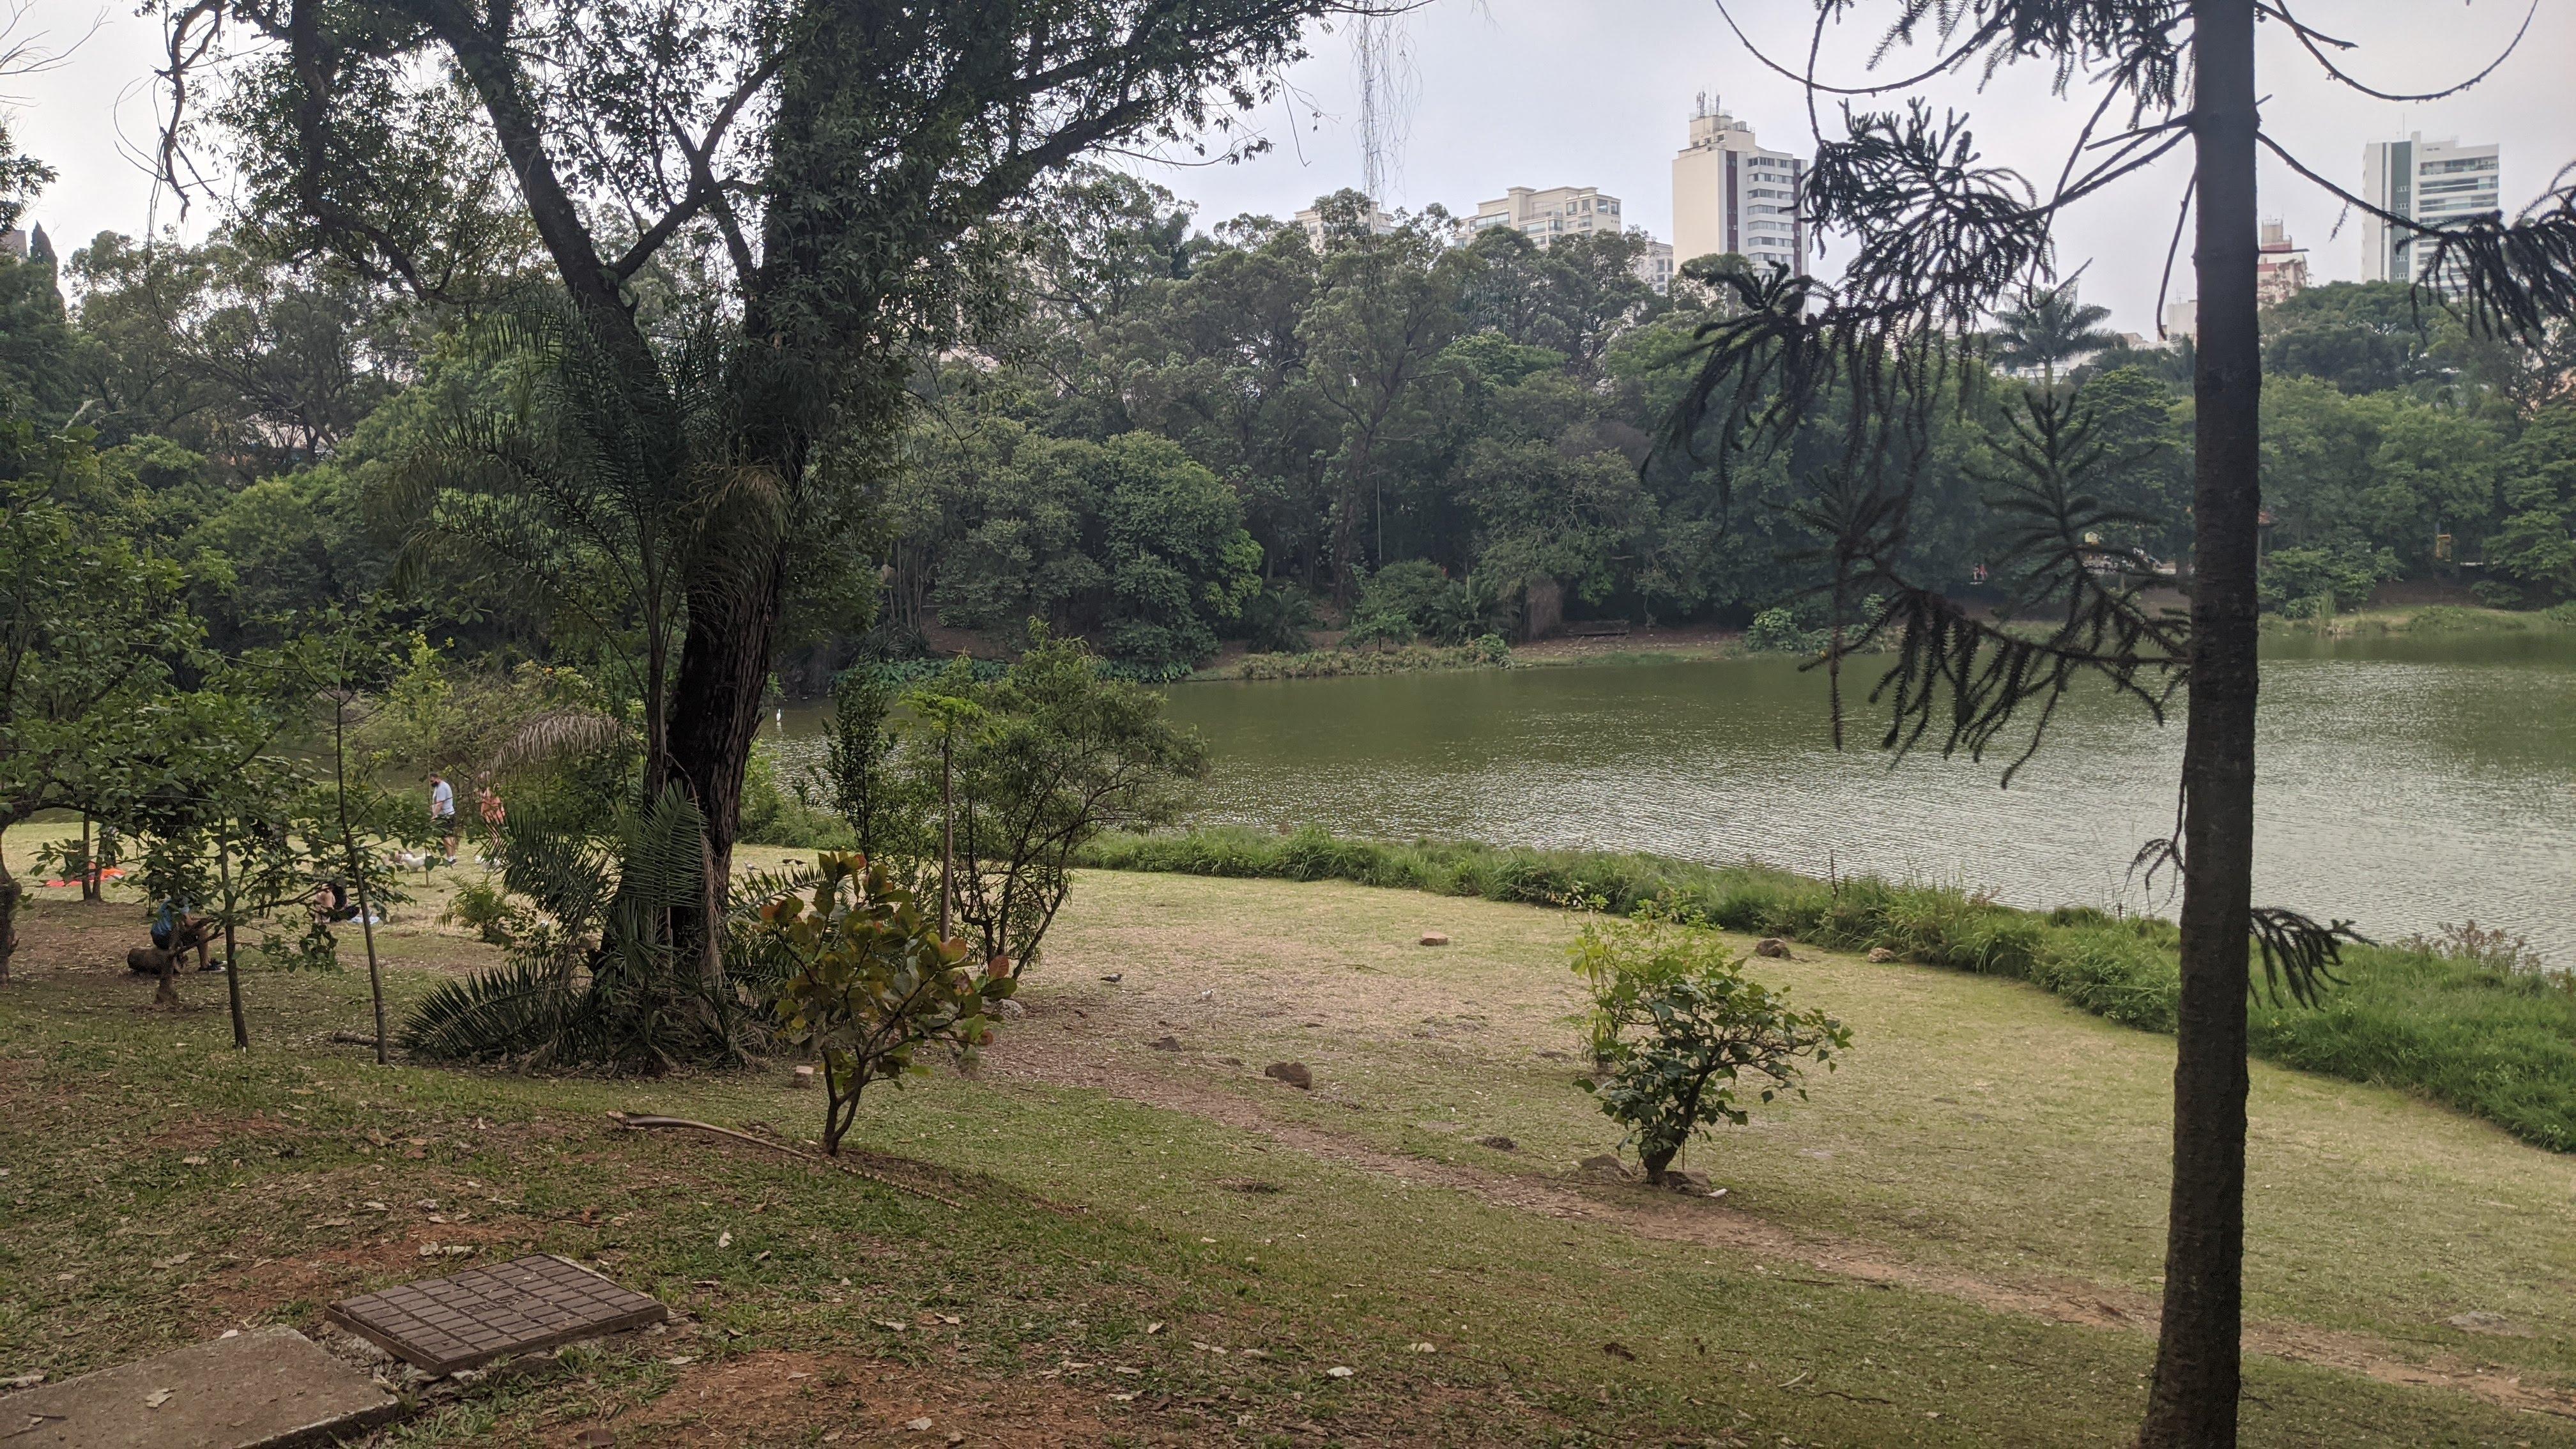 ibirapuera park sao paulo largest park in sao paulo